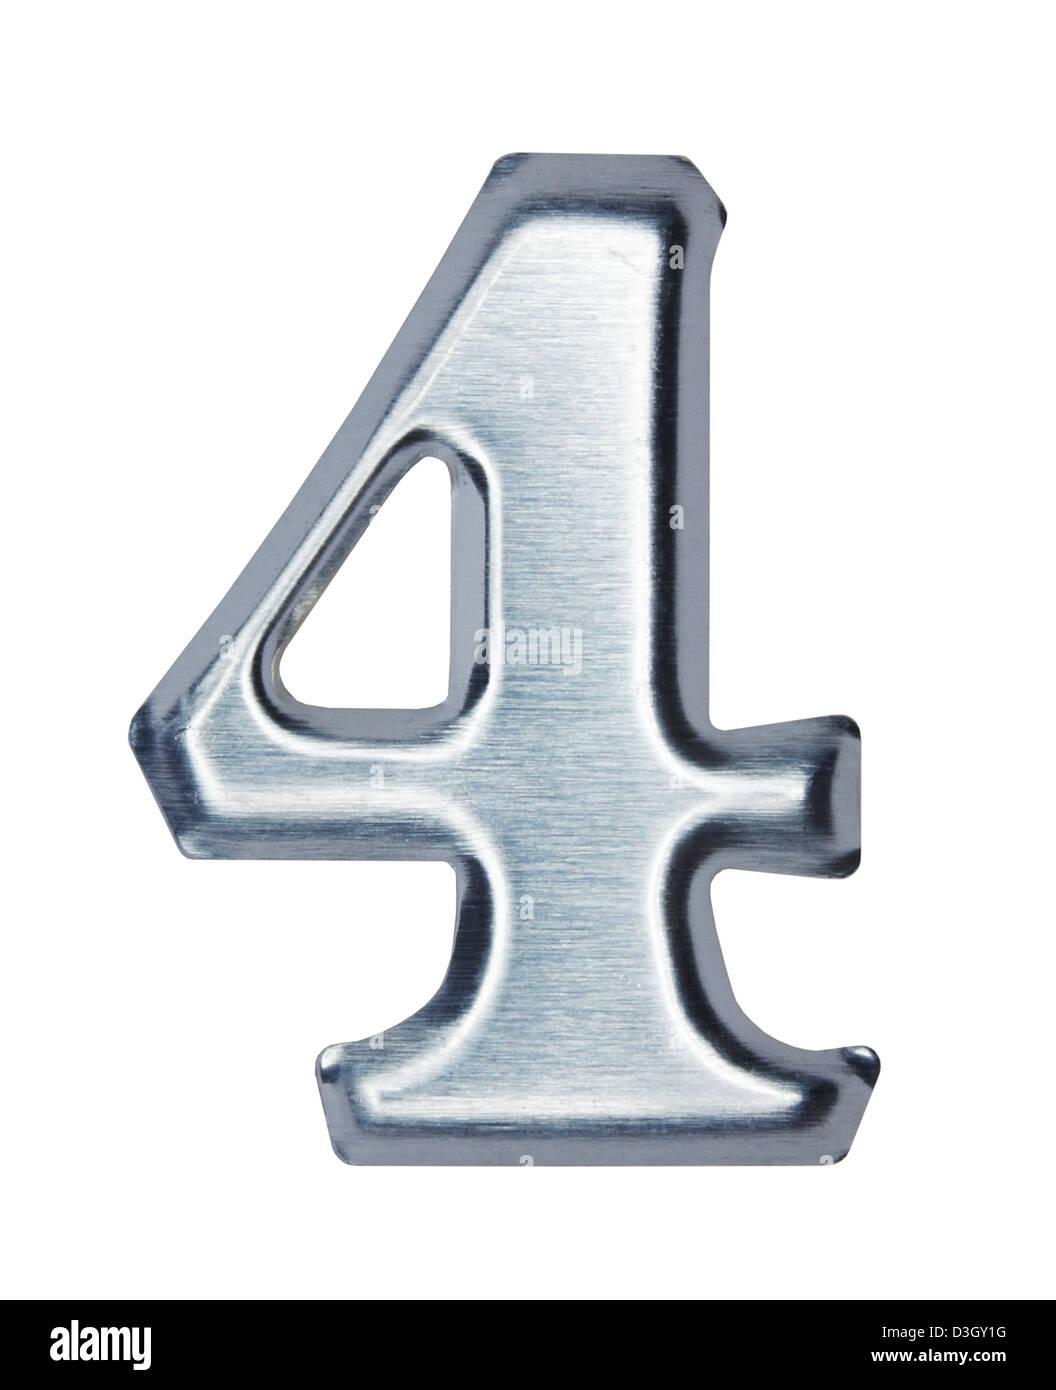 Brushed metal Number 4 four - Stock Image